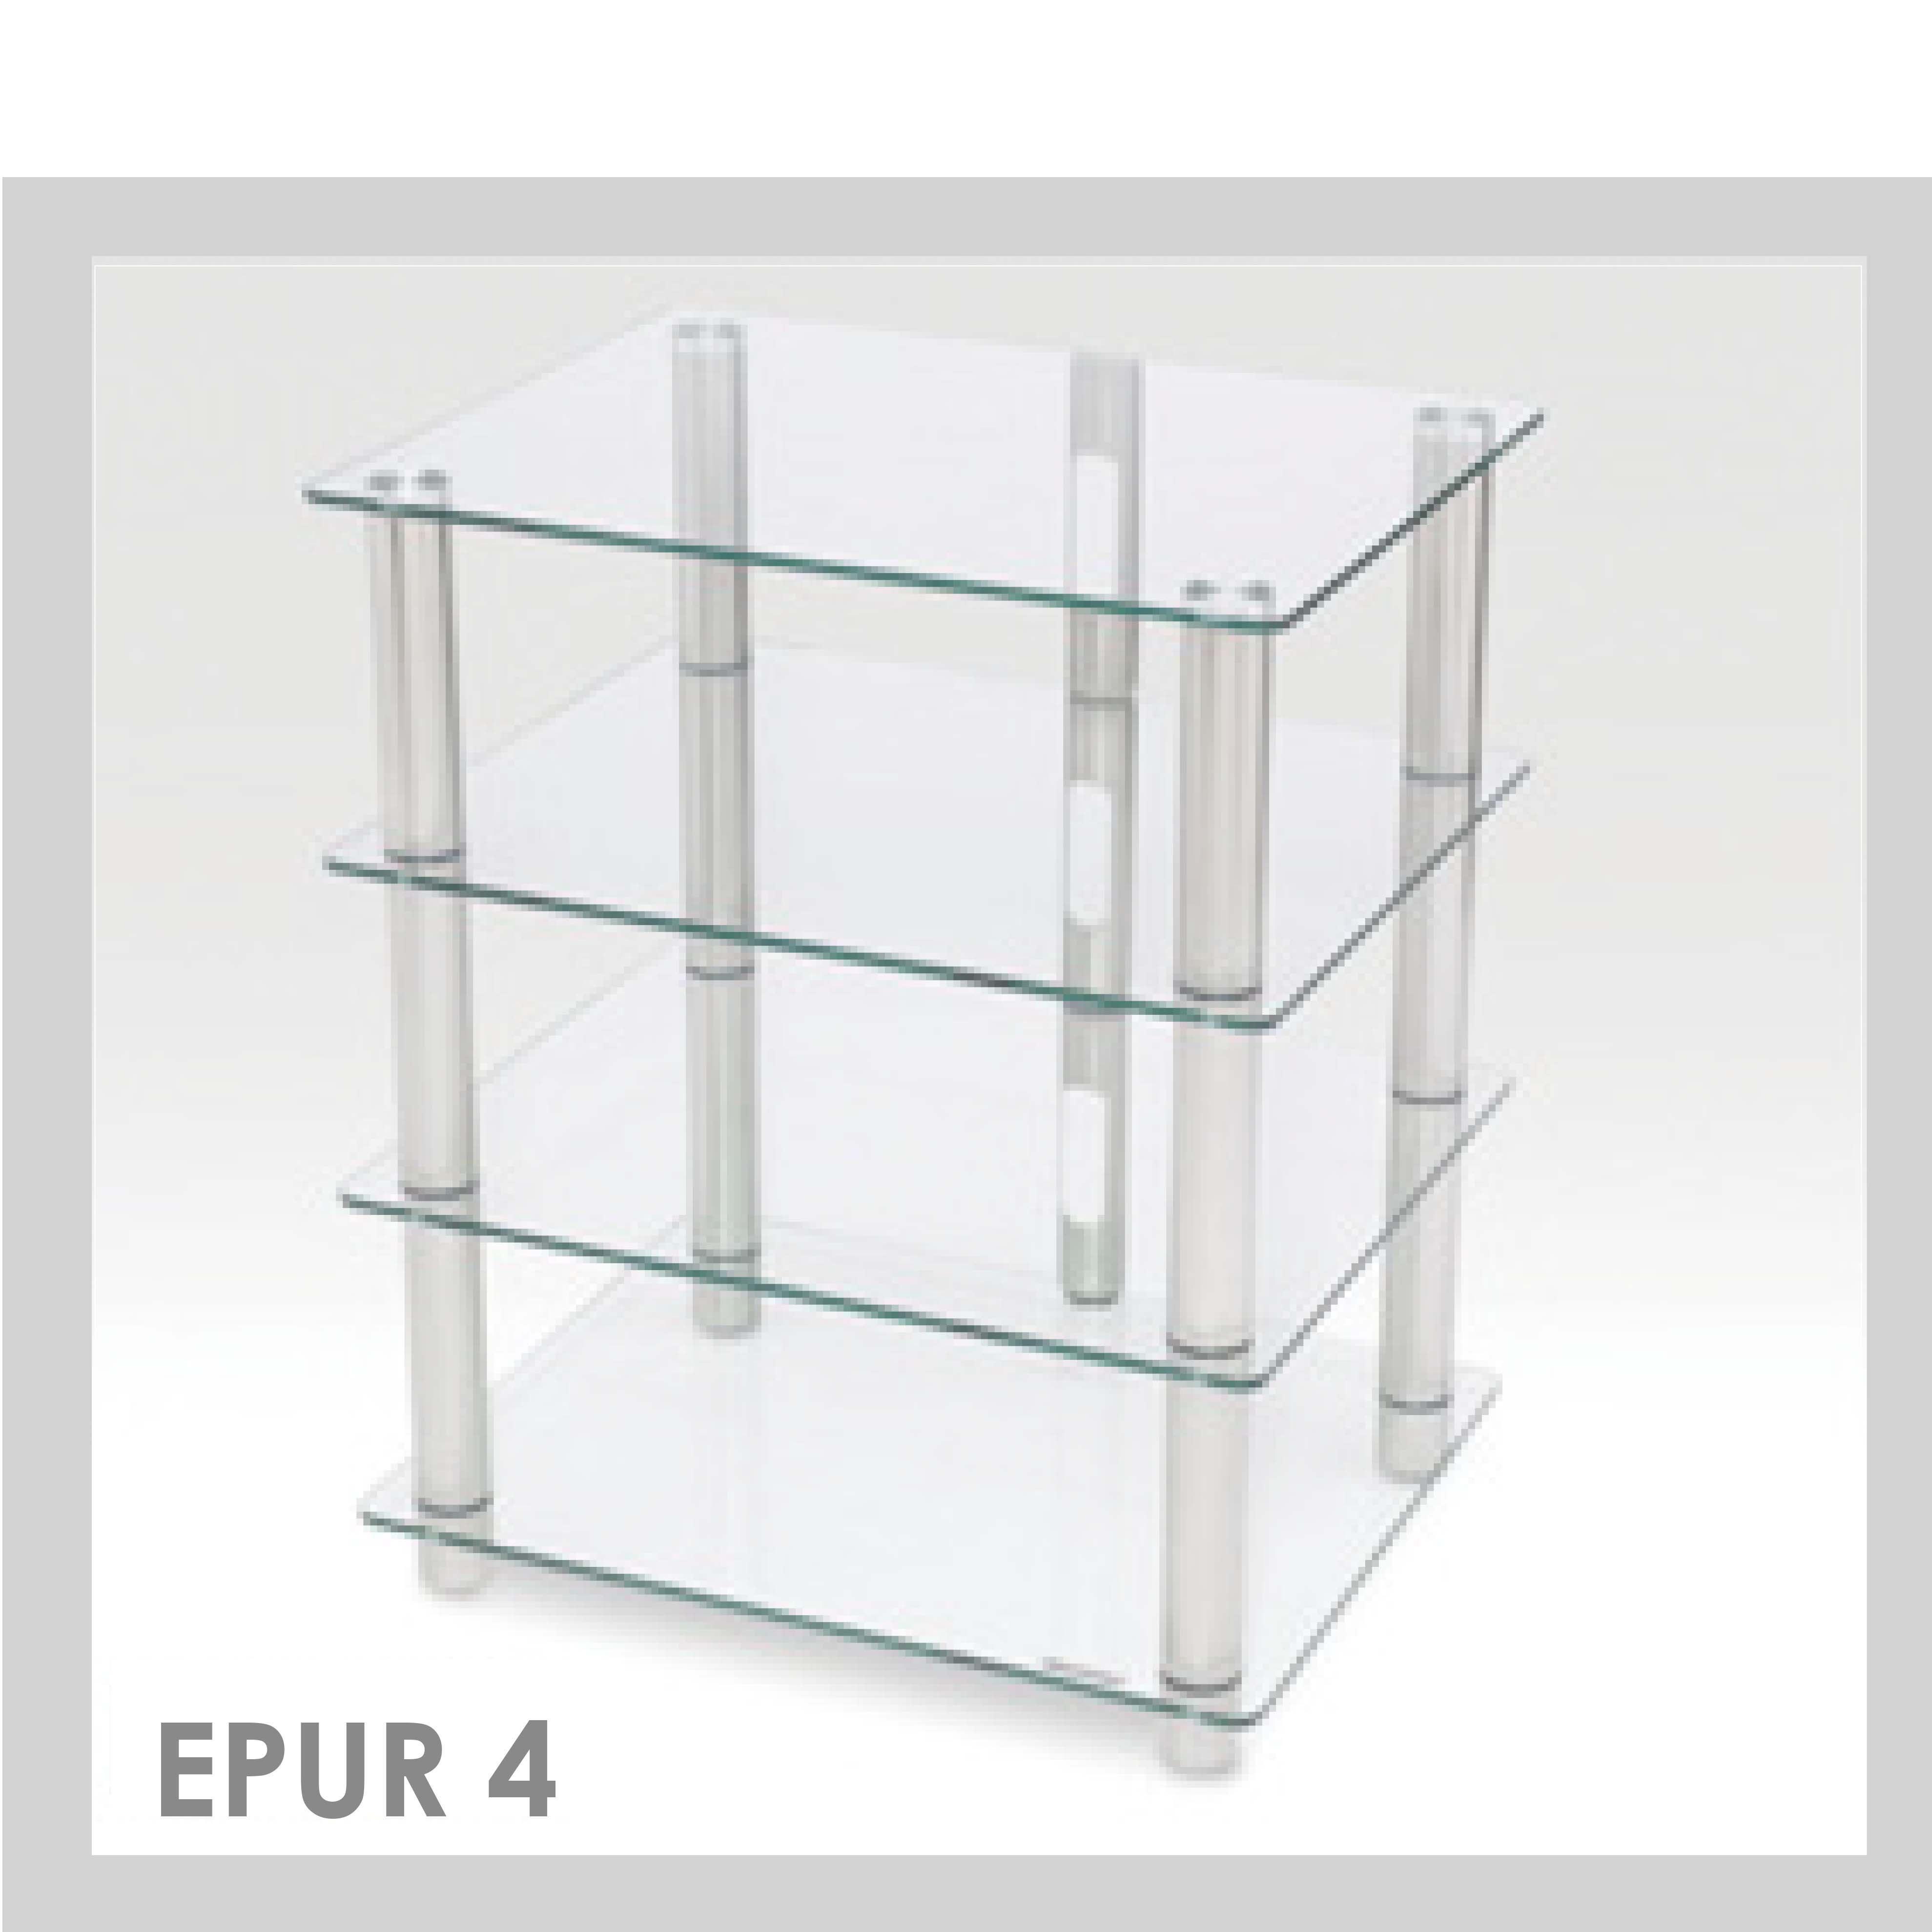 NorStone ノーストーン LifeStyle AV Hi-Fi furniture EPUR 4